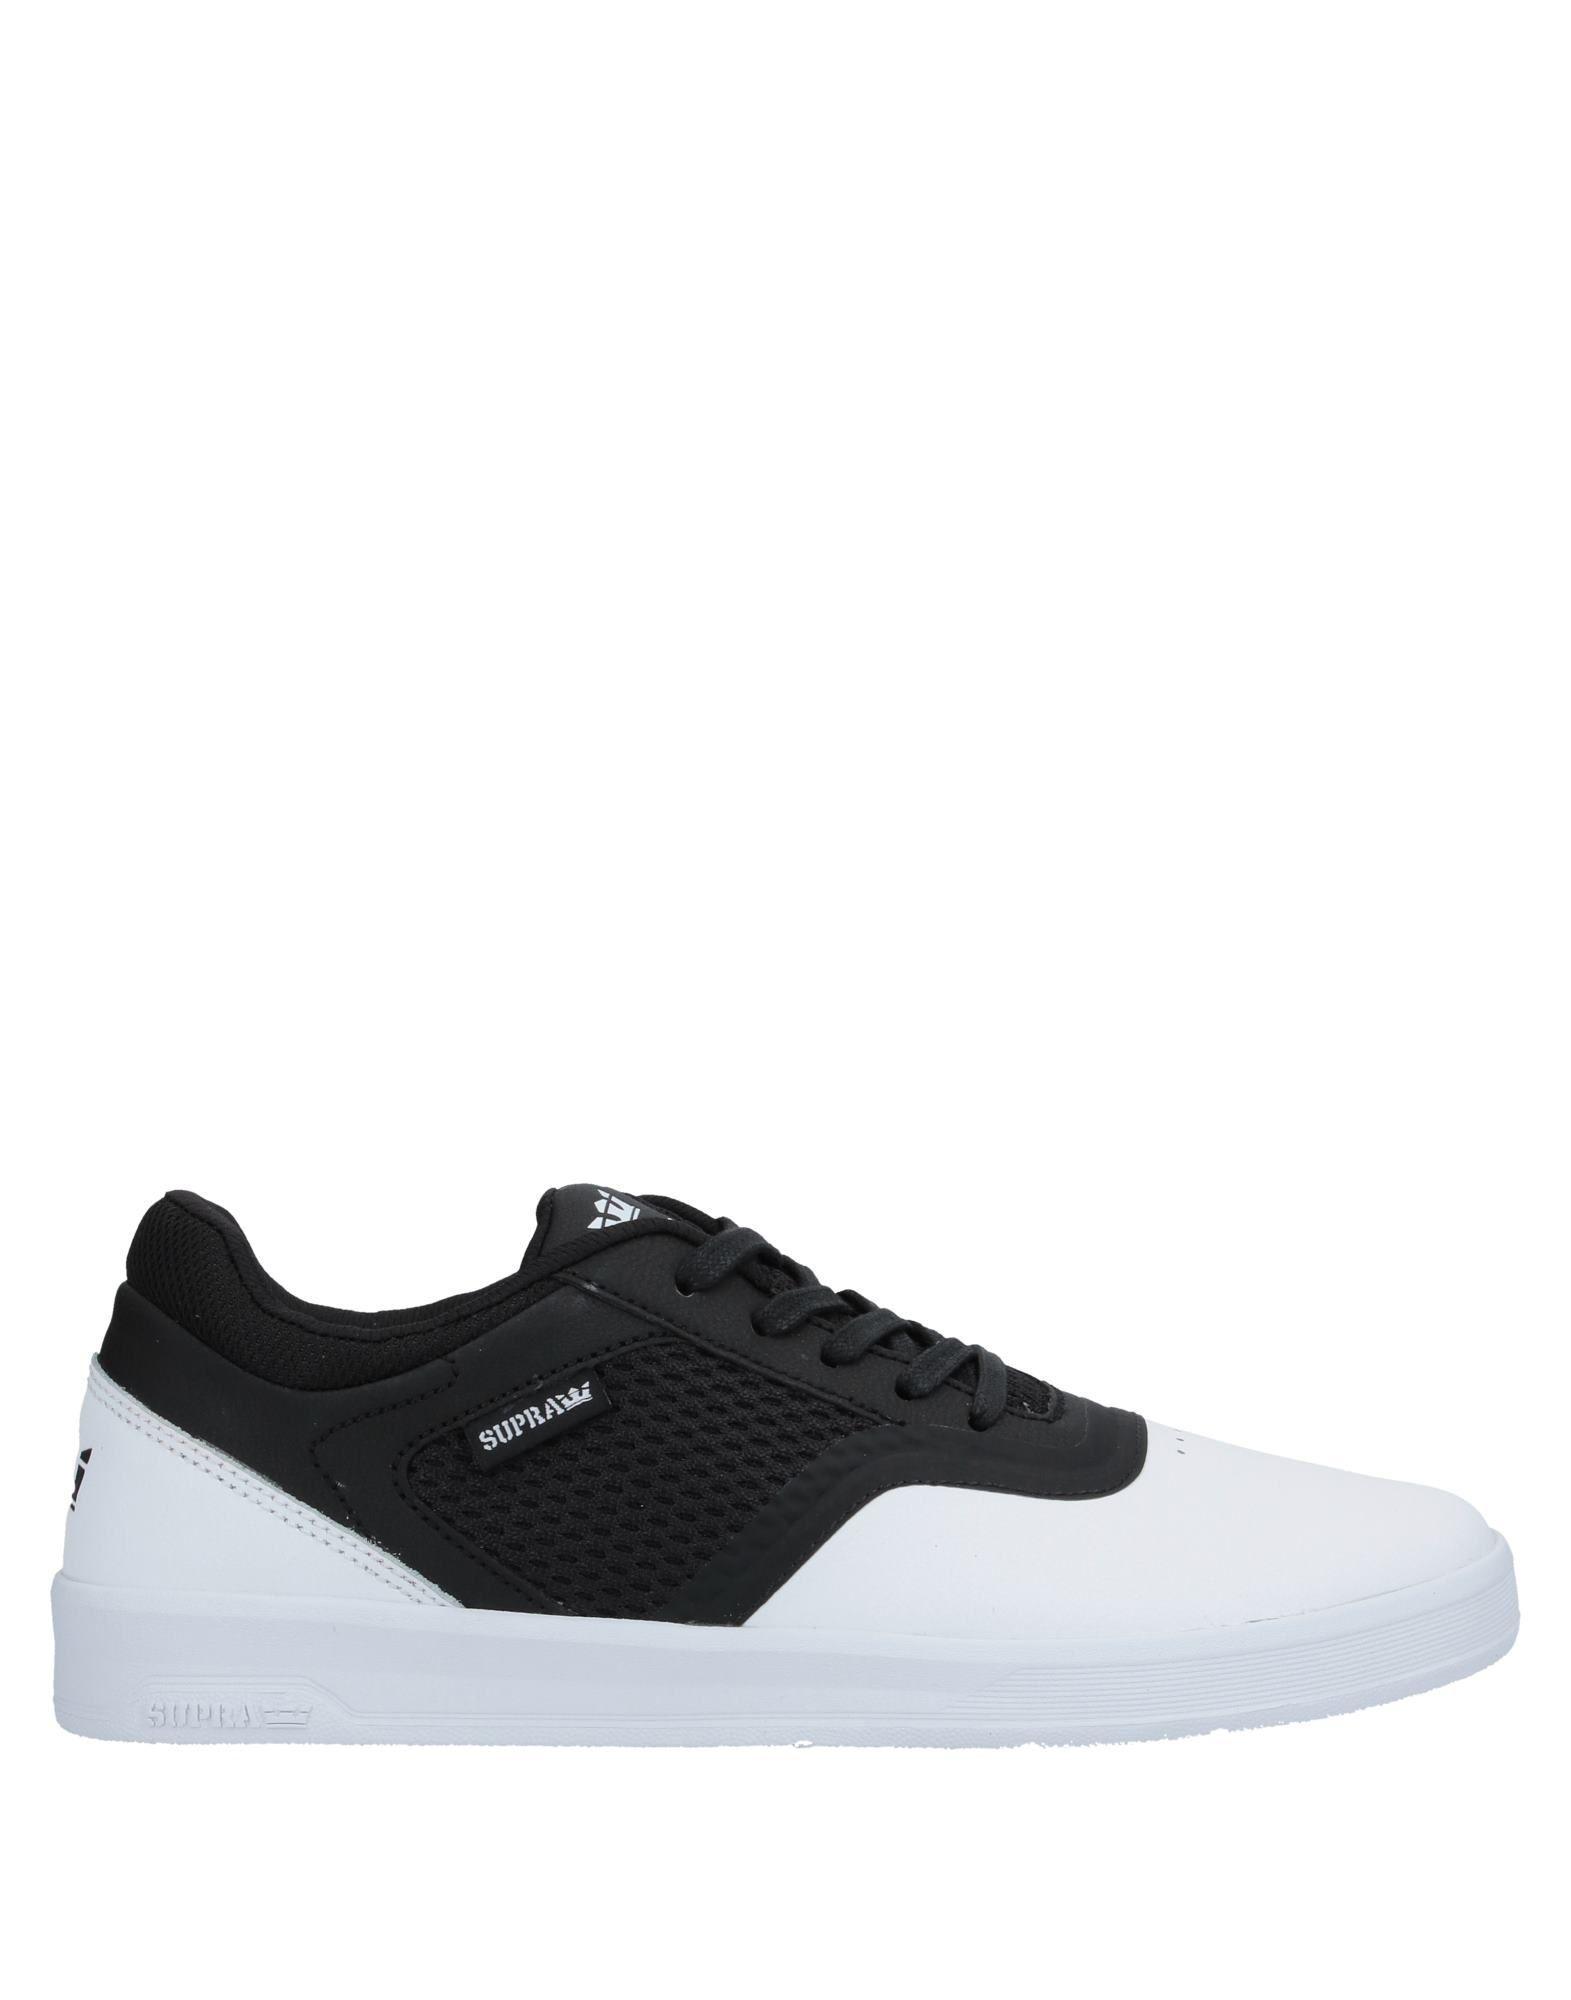 f56b428c1b Supra Low-tops & Sneakers in White for Men - Lyst